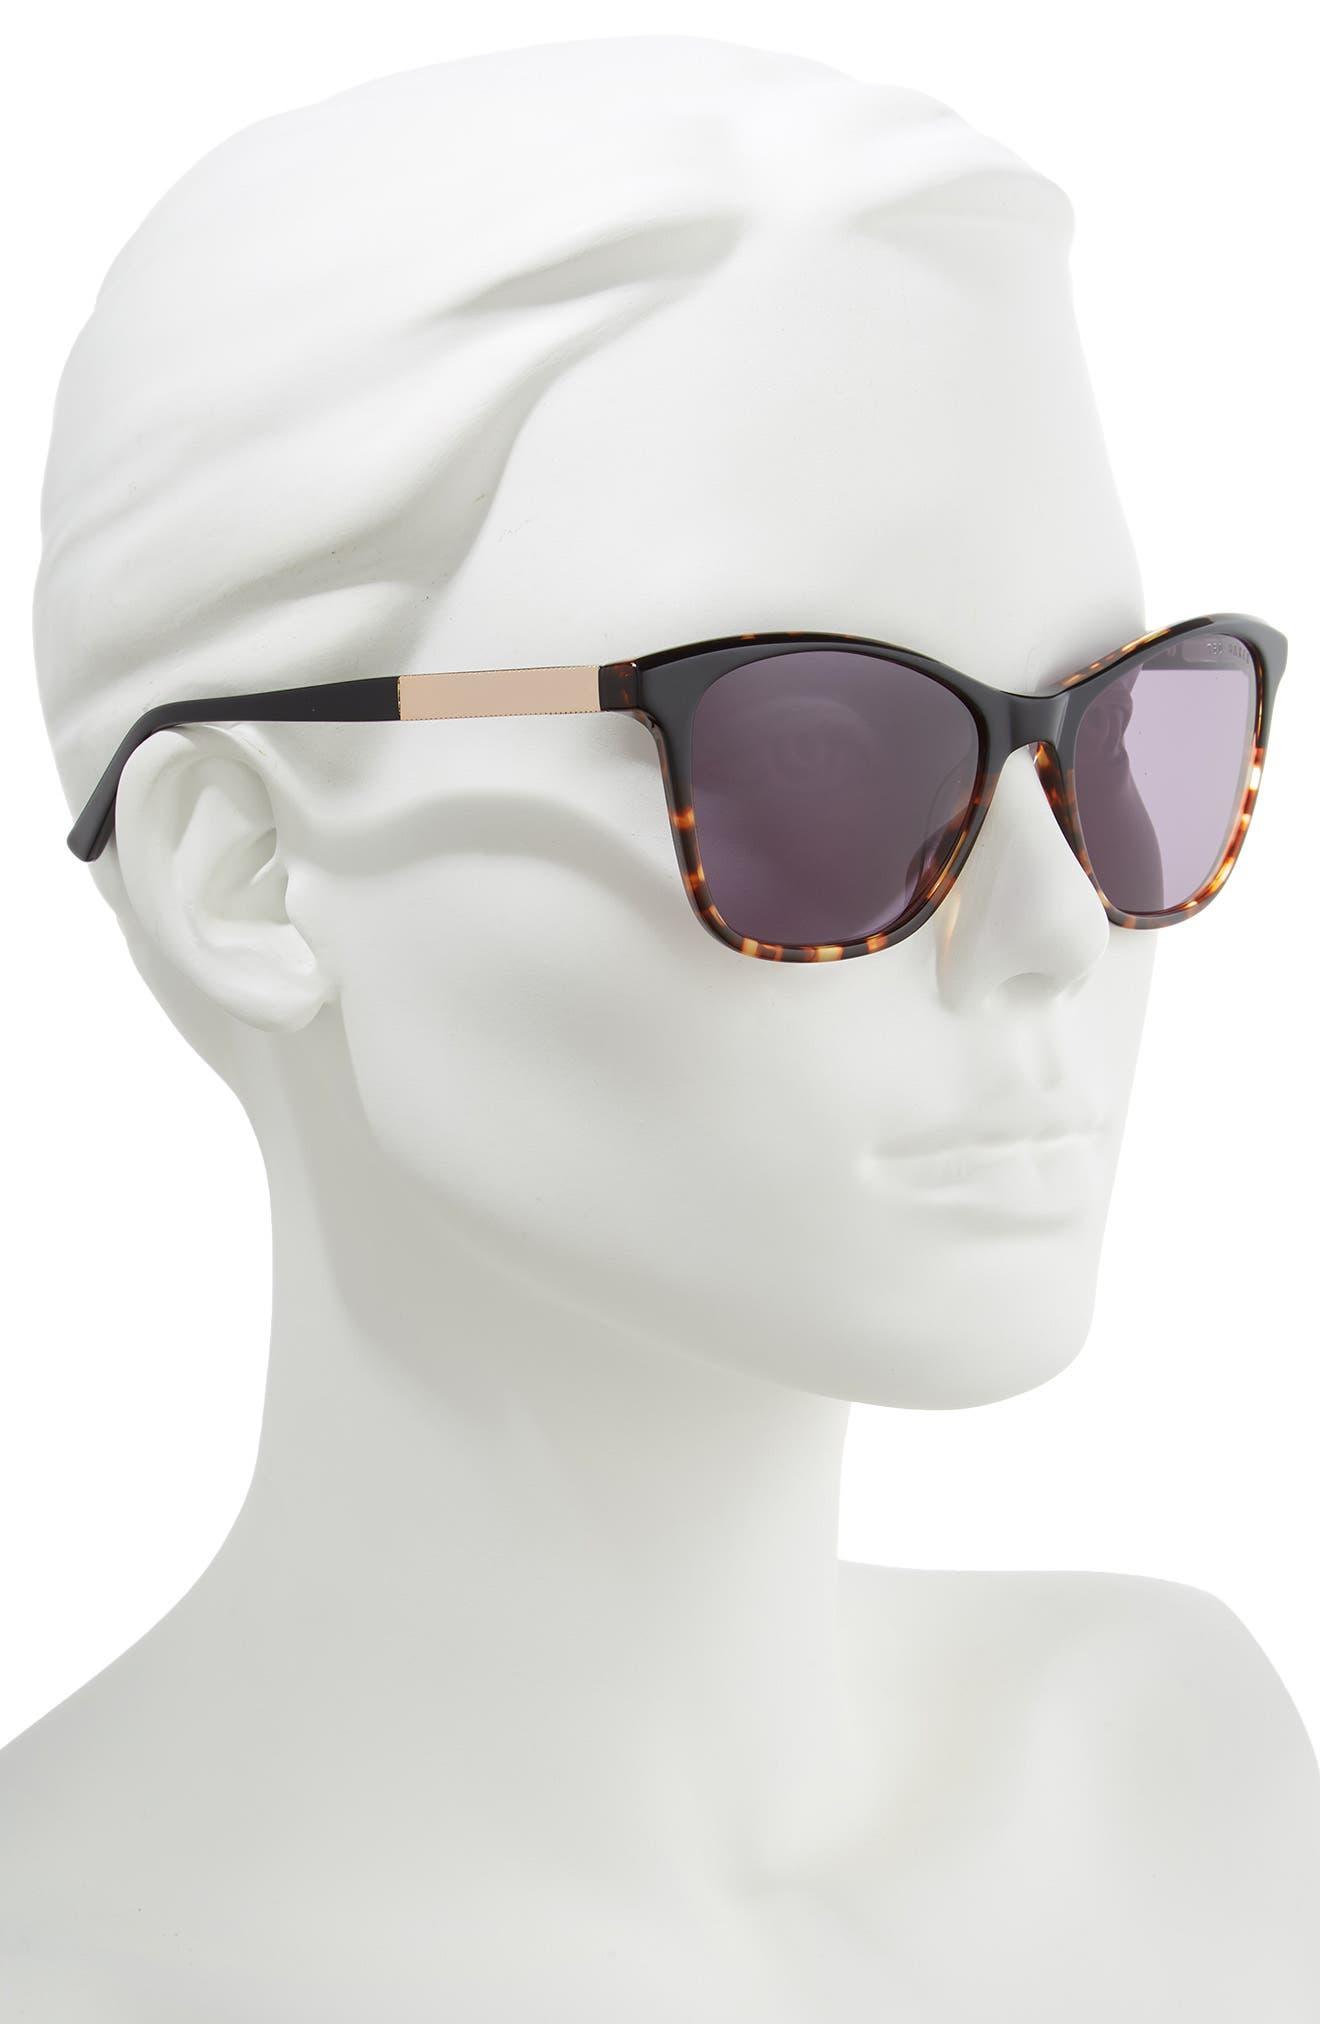 TED BAKER LONDON, 55mm Square Cat Eye Sunglasses, Alternate thumbnail 2, color, BLACK HAVANA/ GOLD/ PURPLE